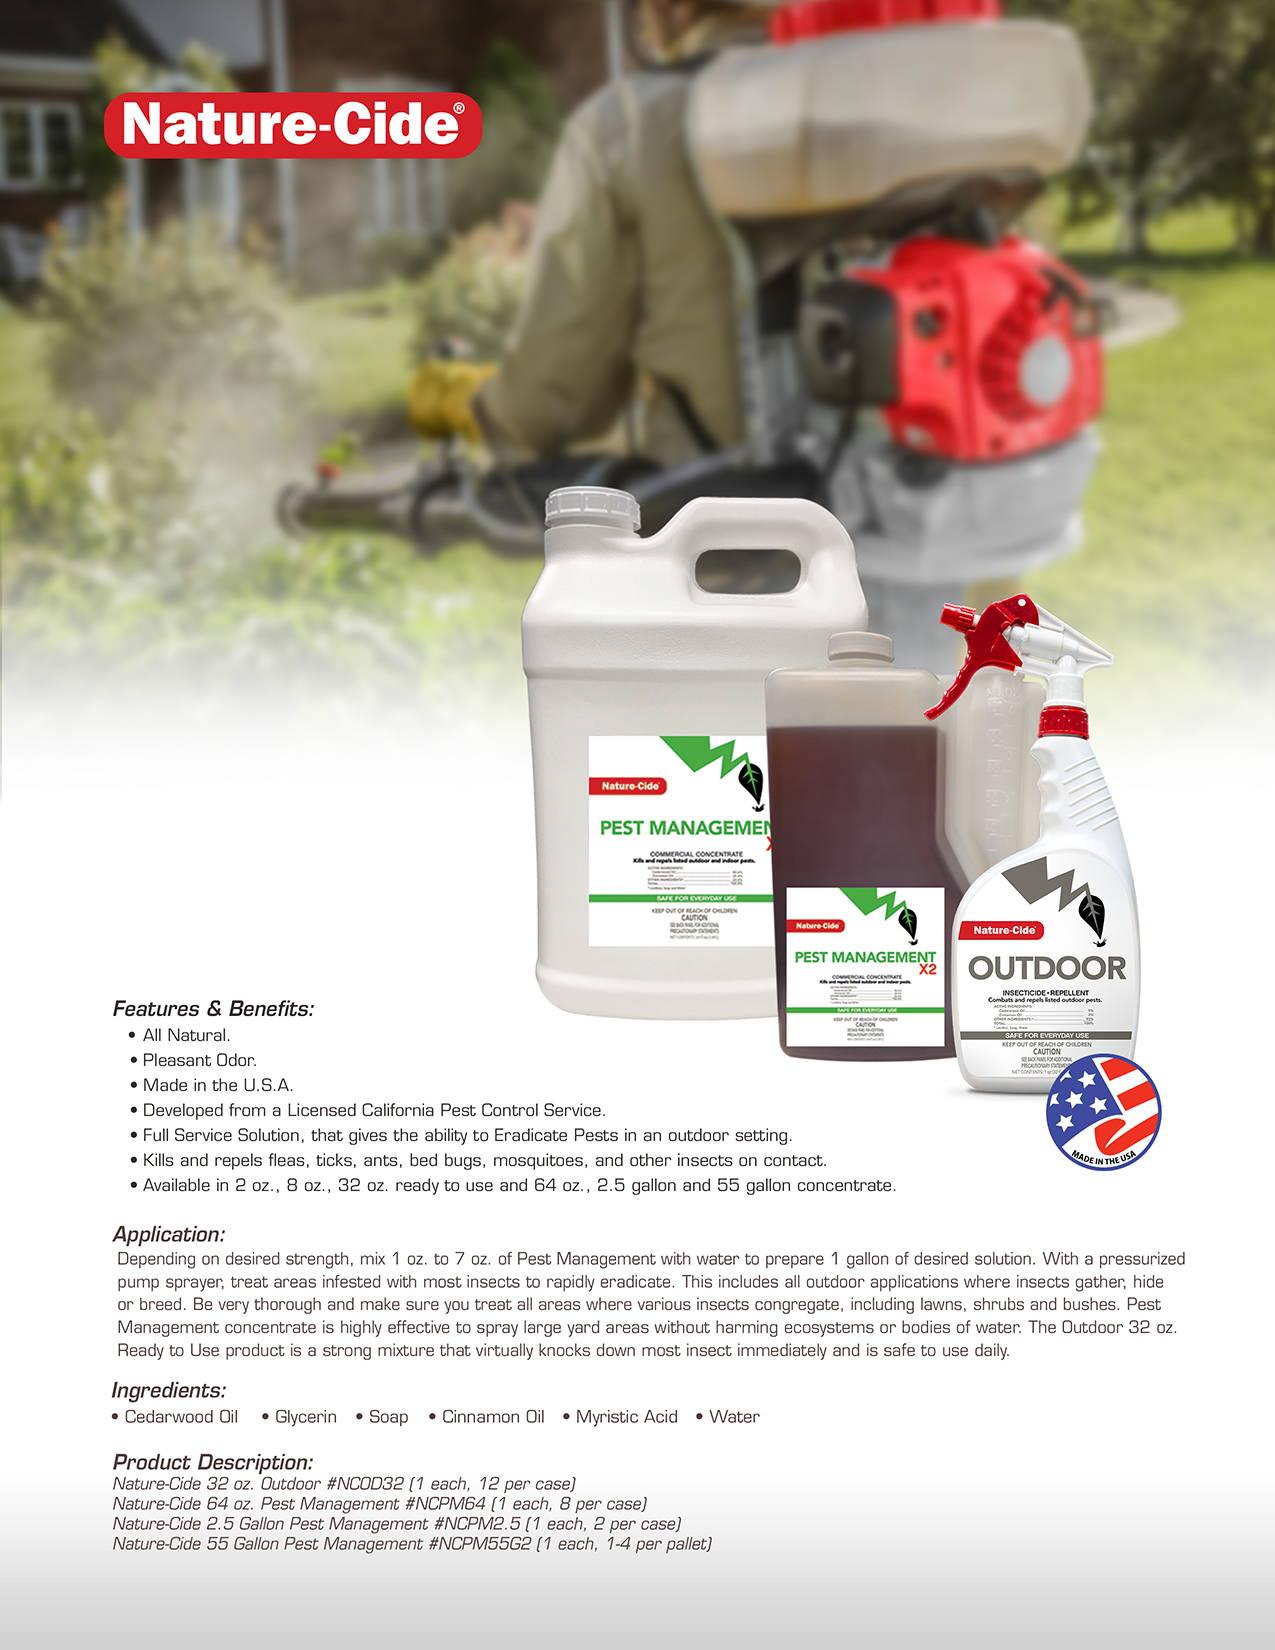 Nature-Cide Pest Management Product Info